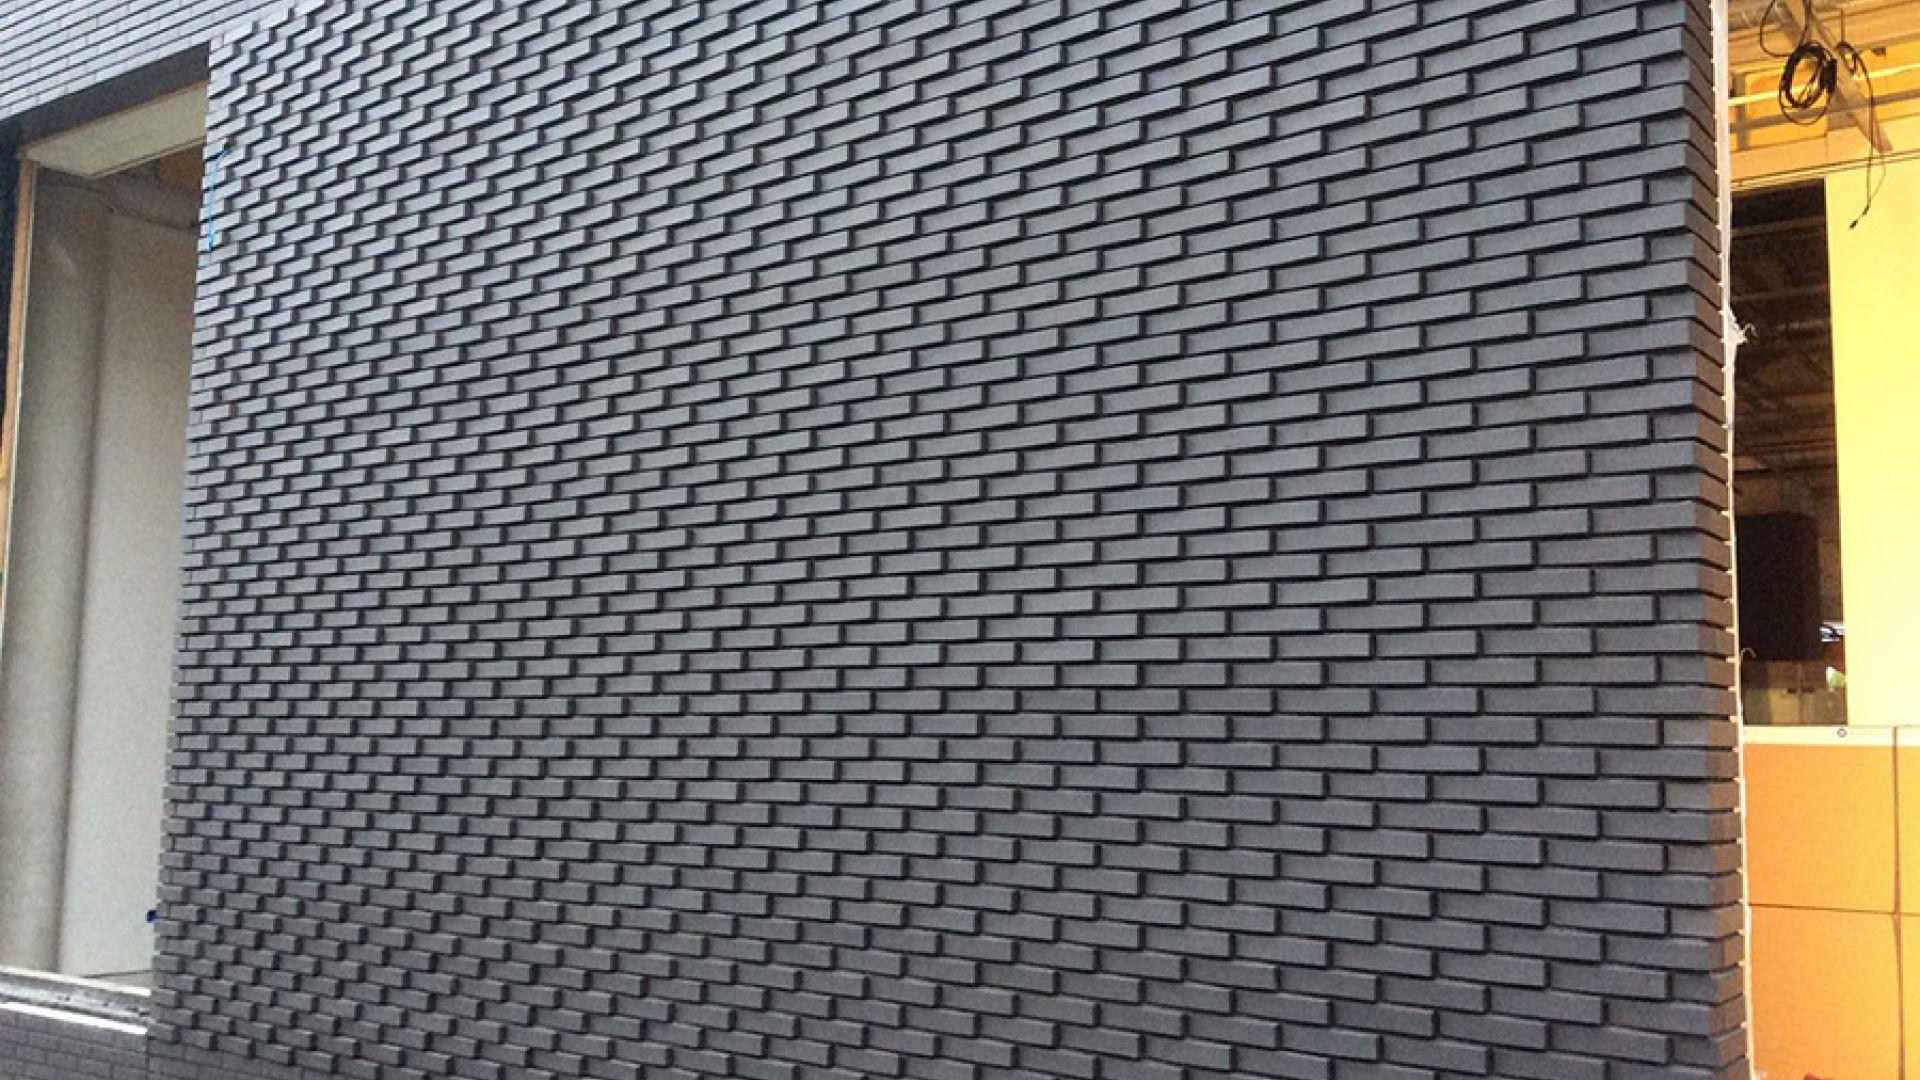 Kunststof Tegels Praxis : Balkon tegels praxis. best wandpaneel wandpaneele holz kuche